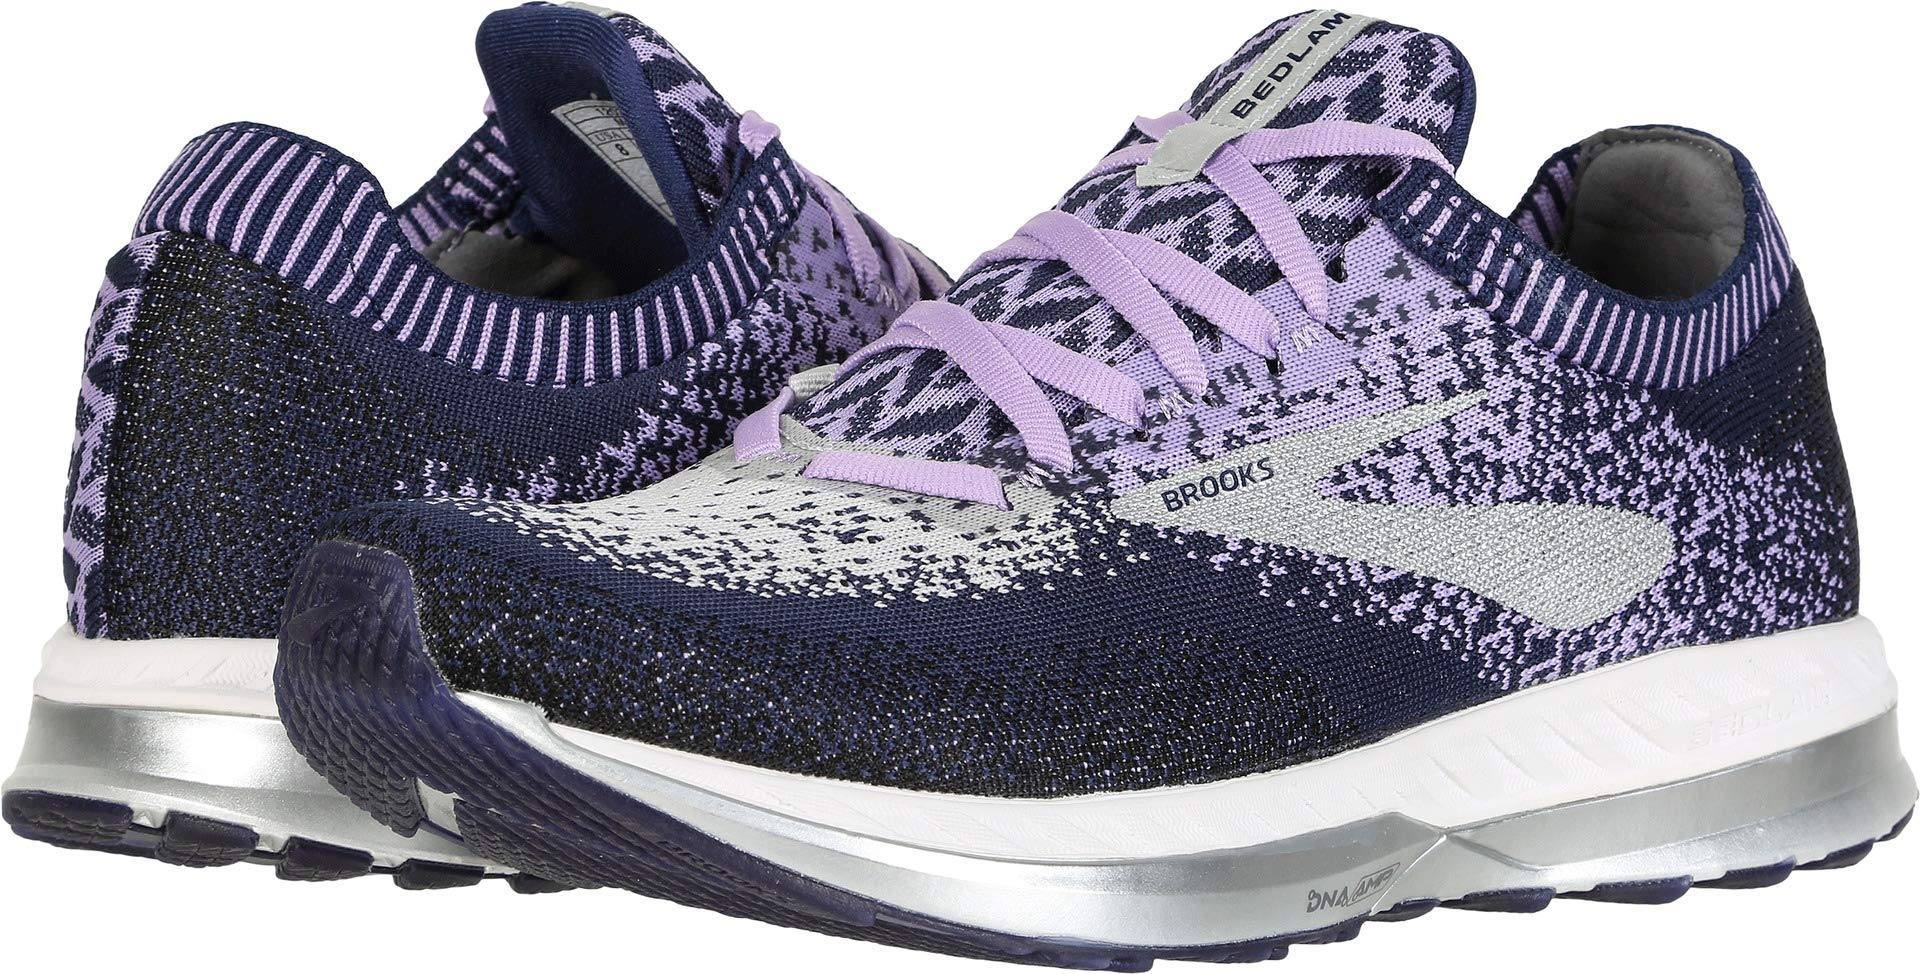 Brooks Women's Bedlam Purple/Navy/Grey 6.5 B US by Brooks